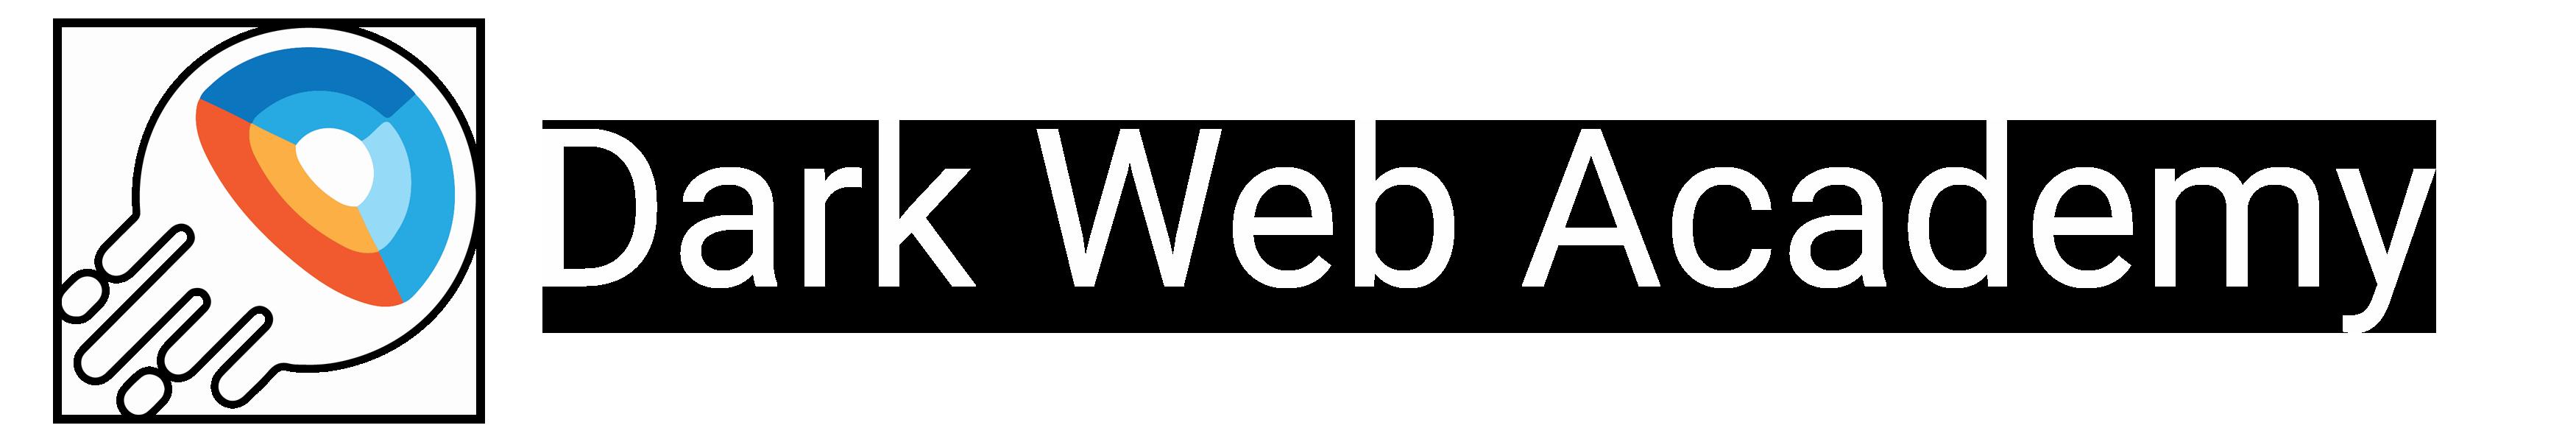 Dark Web Academy Logo